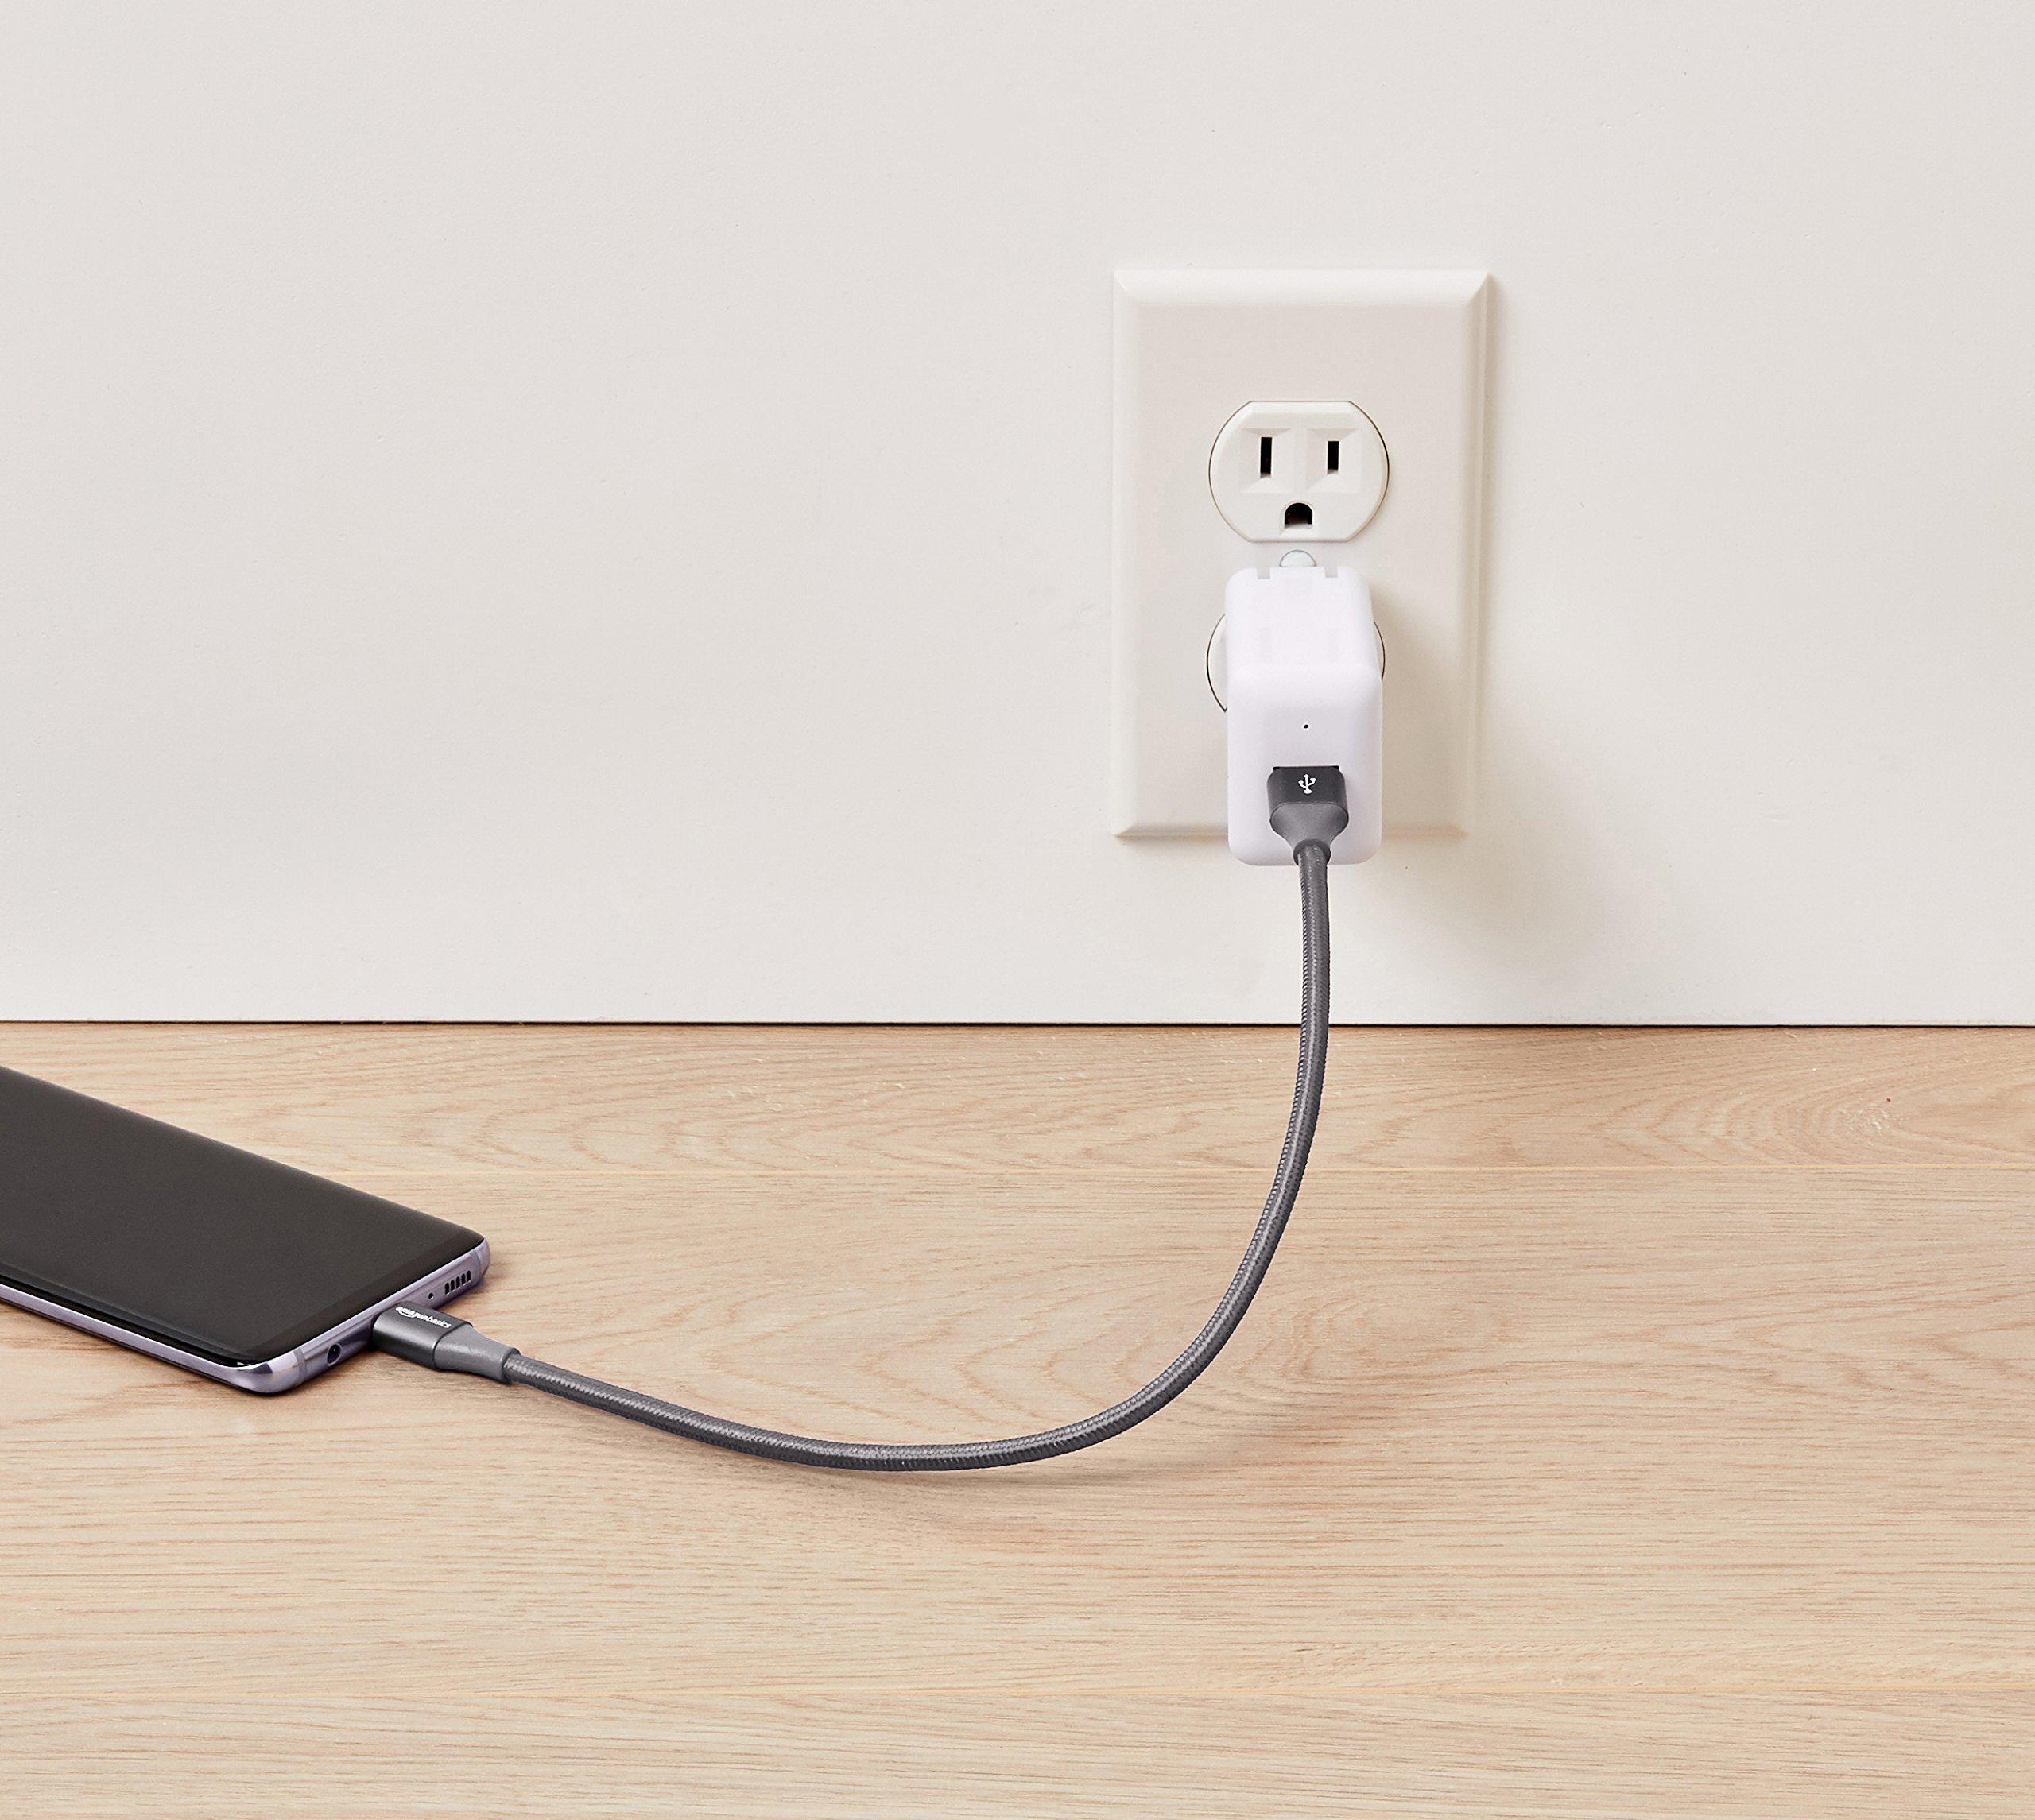 AmazonBasics Double Braided Nylon USB Type-C to Type-A 3.1 Gen 2 Cable   1 feet, Dark Grey by AmazonBasics (Image #3)